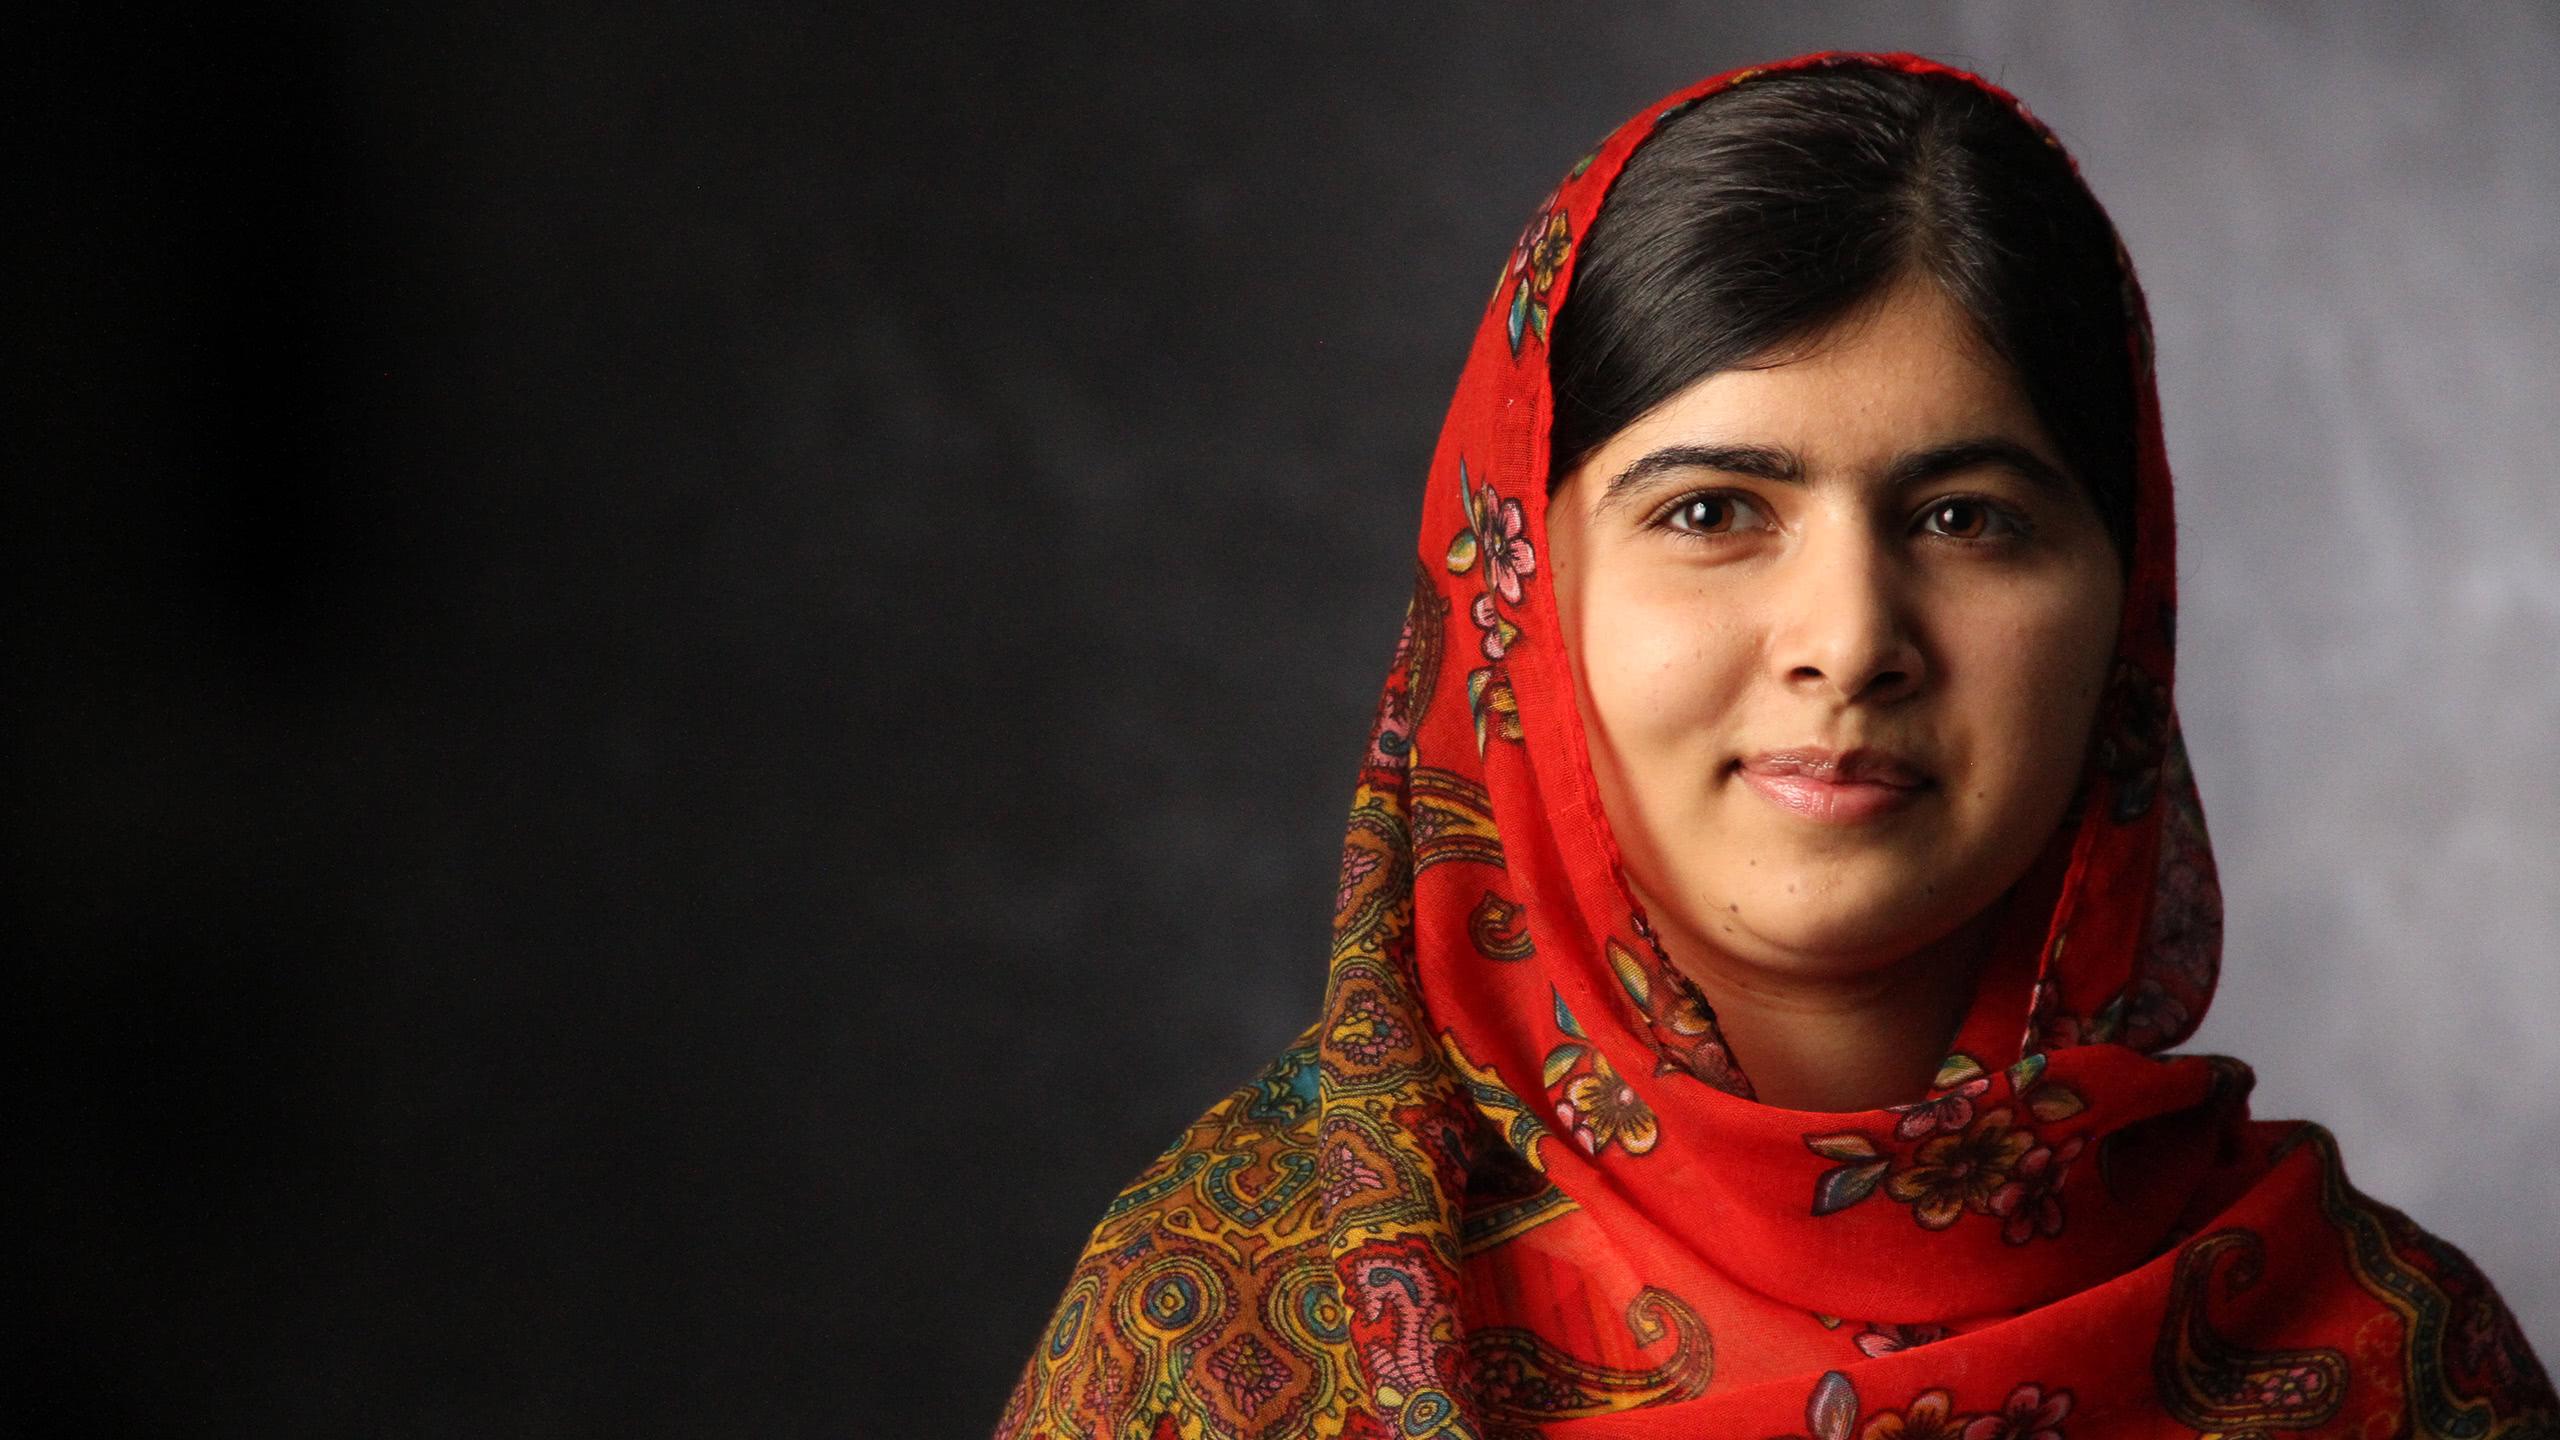 malala yousafzai portrait wqhd 1440p wallpaper